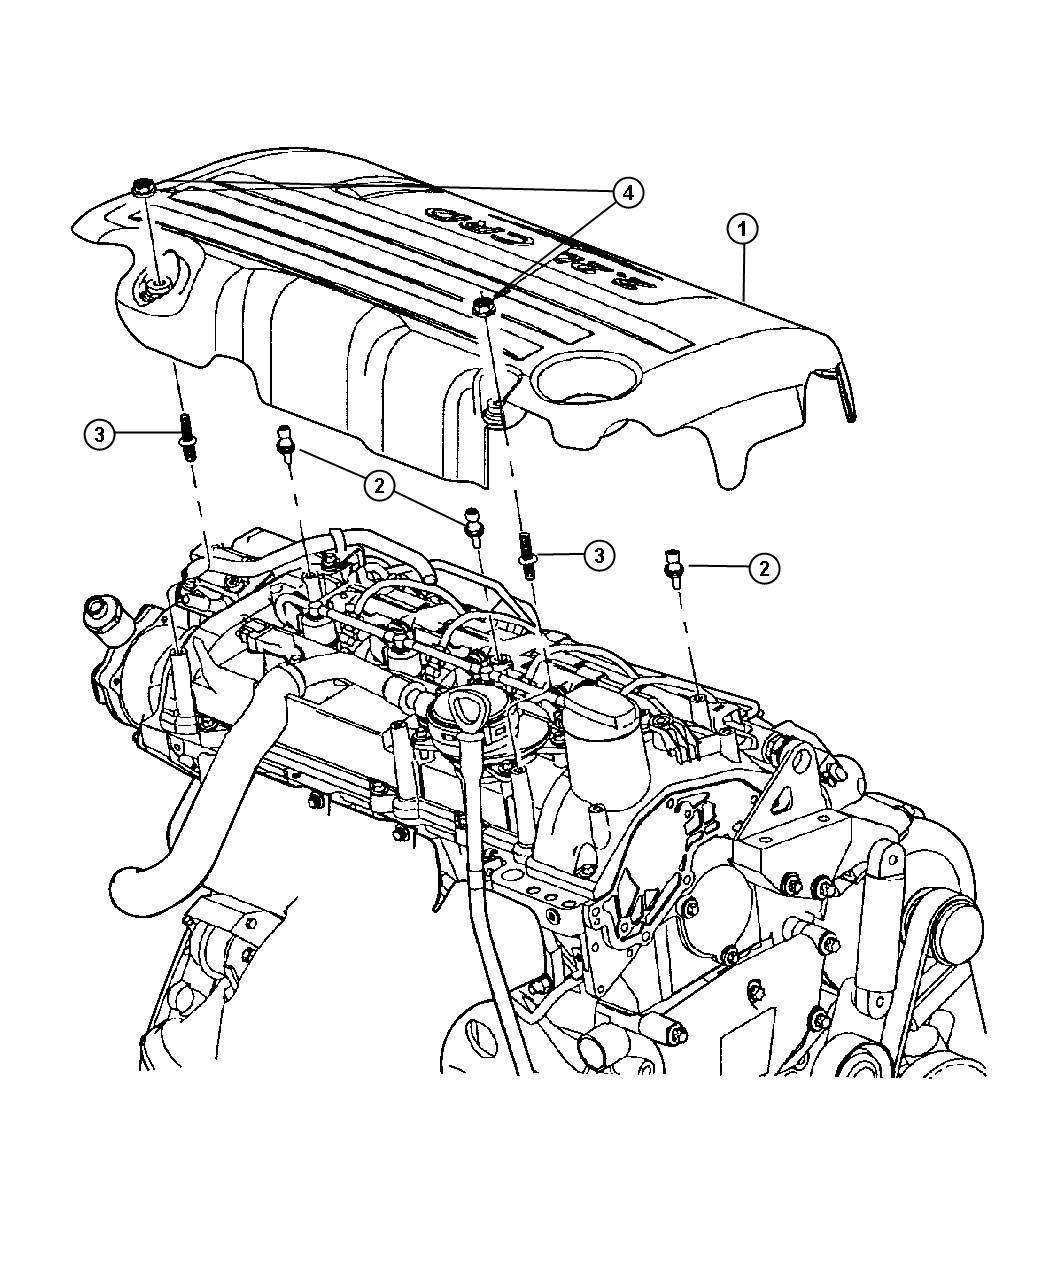 Jeep Grand Cherokee V8 Engine Diagram